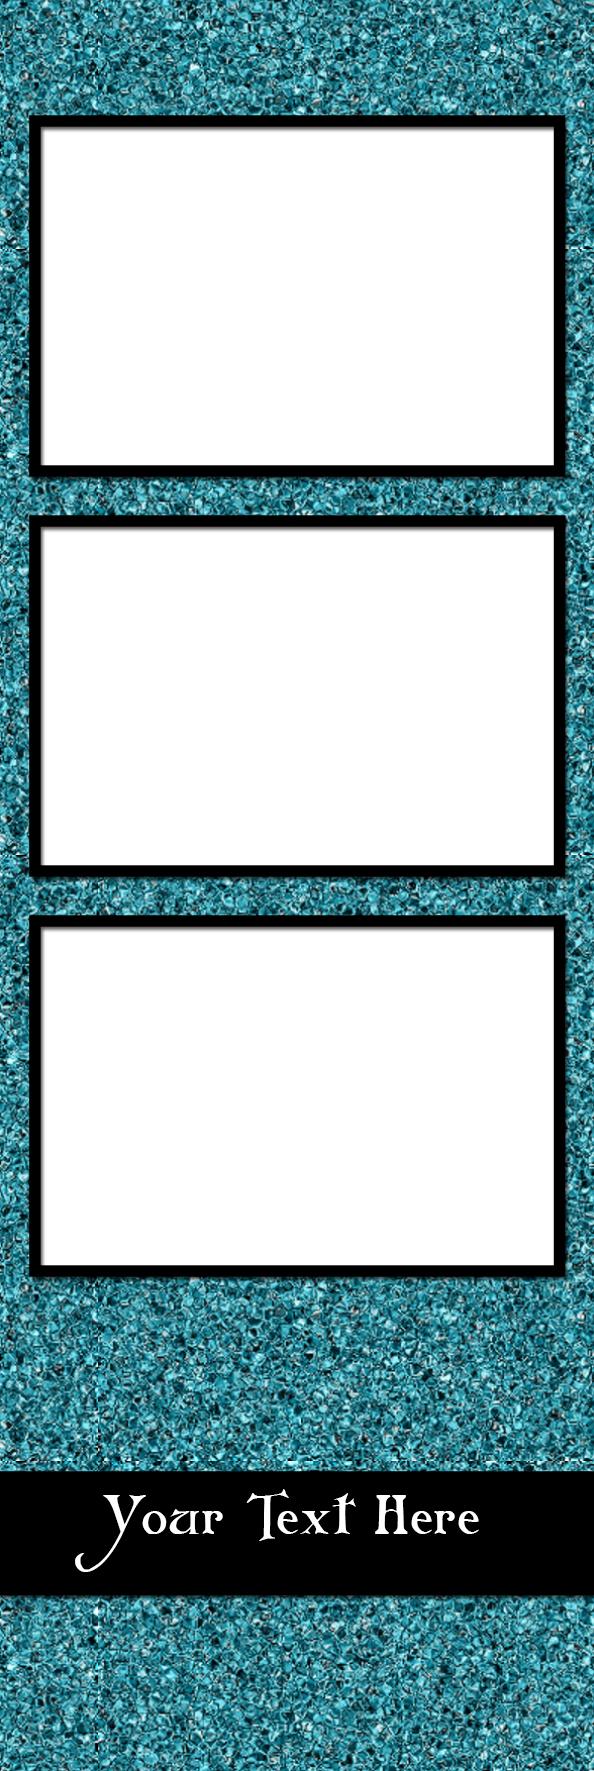 Texture_Glitter-V-6P.jpg